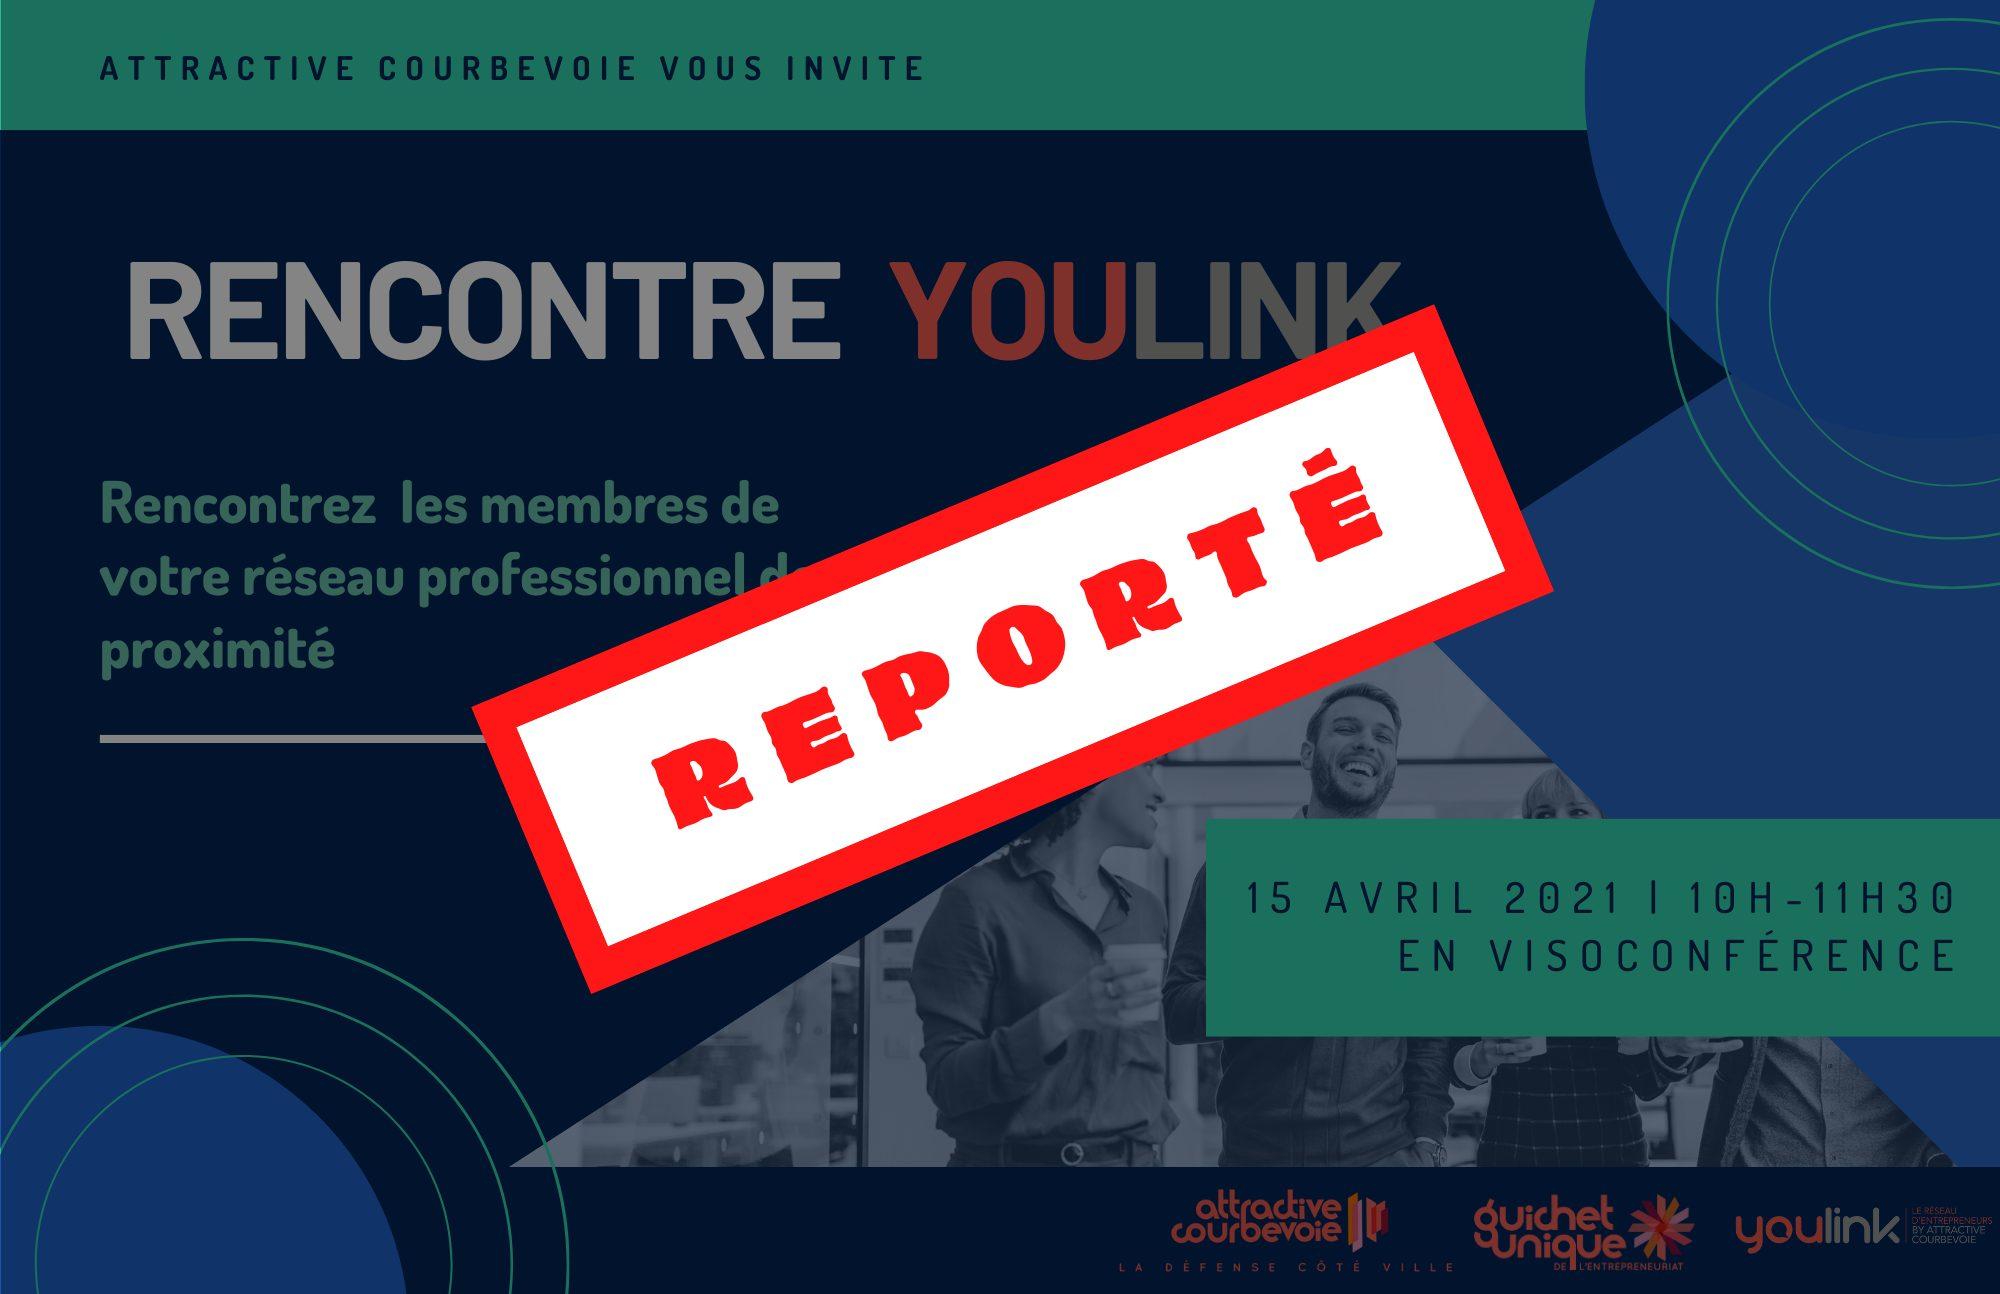 REPORTE rencontre Youlink